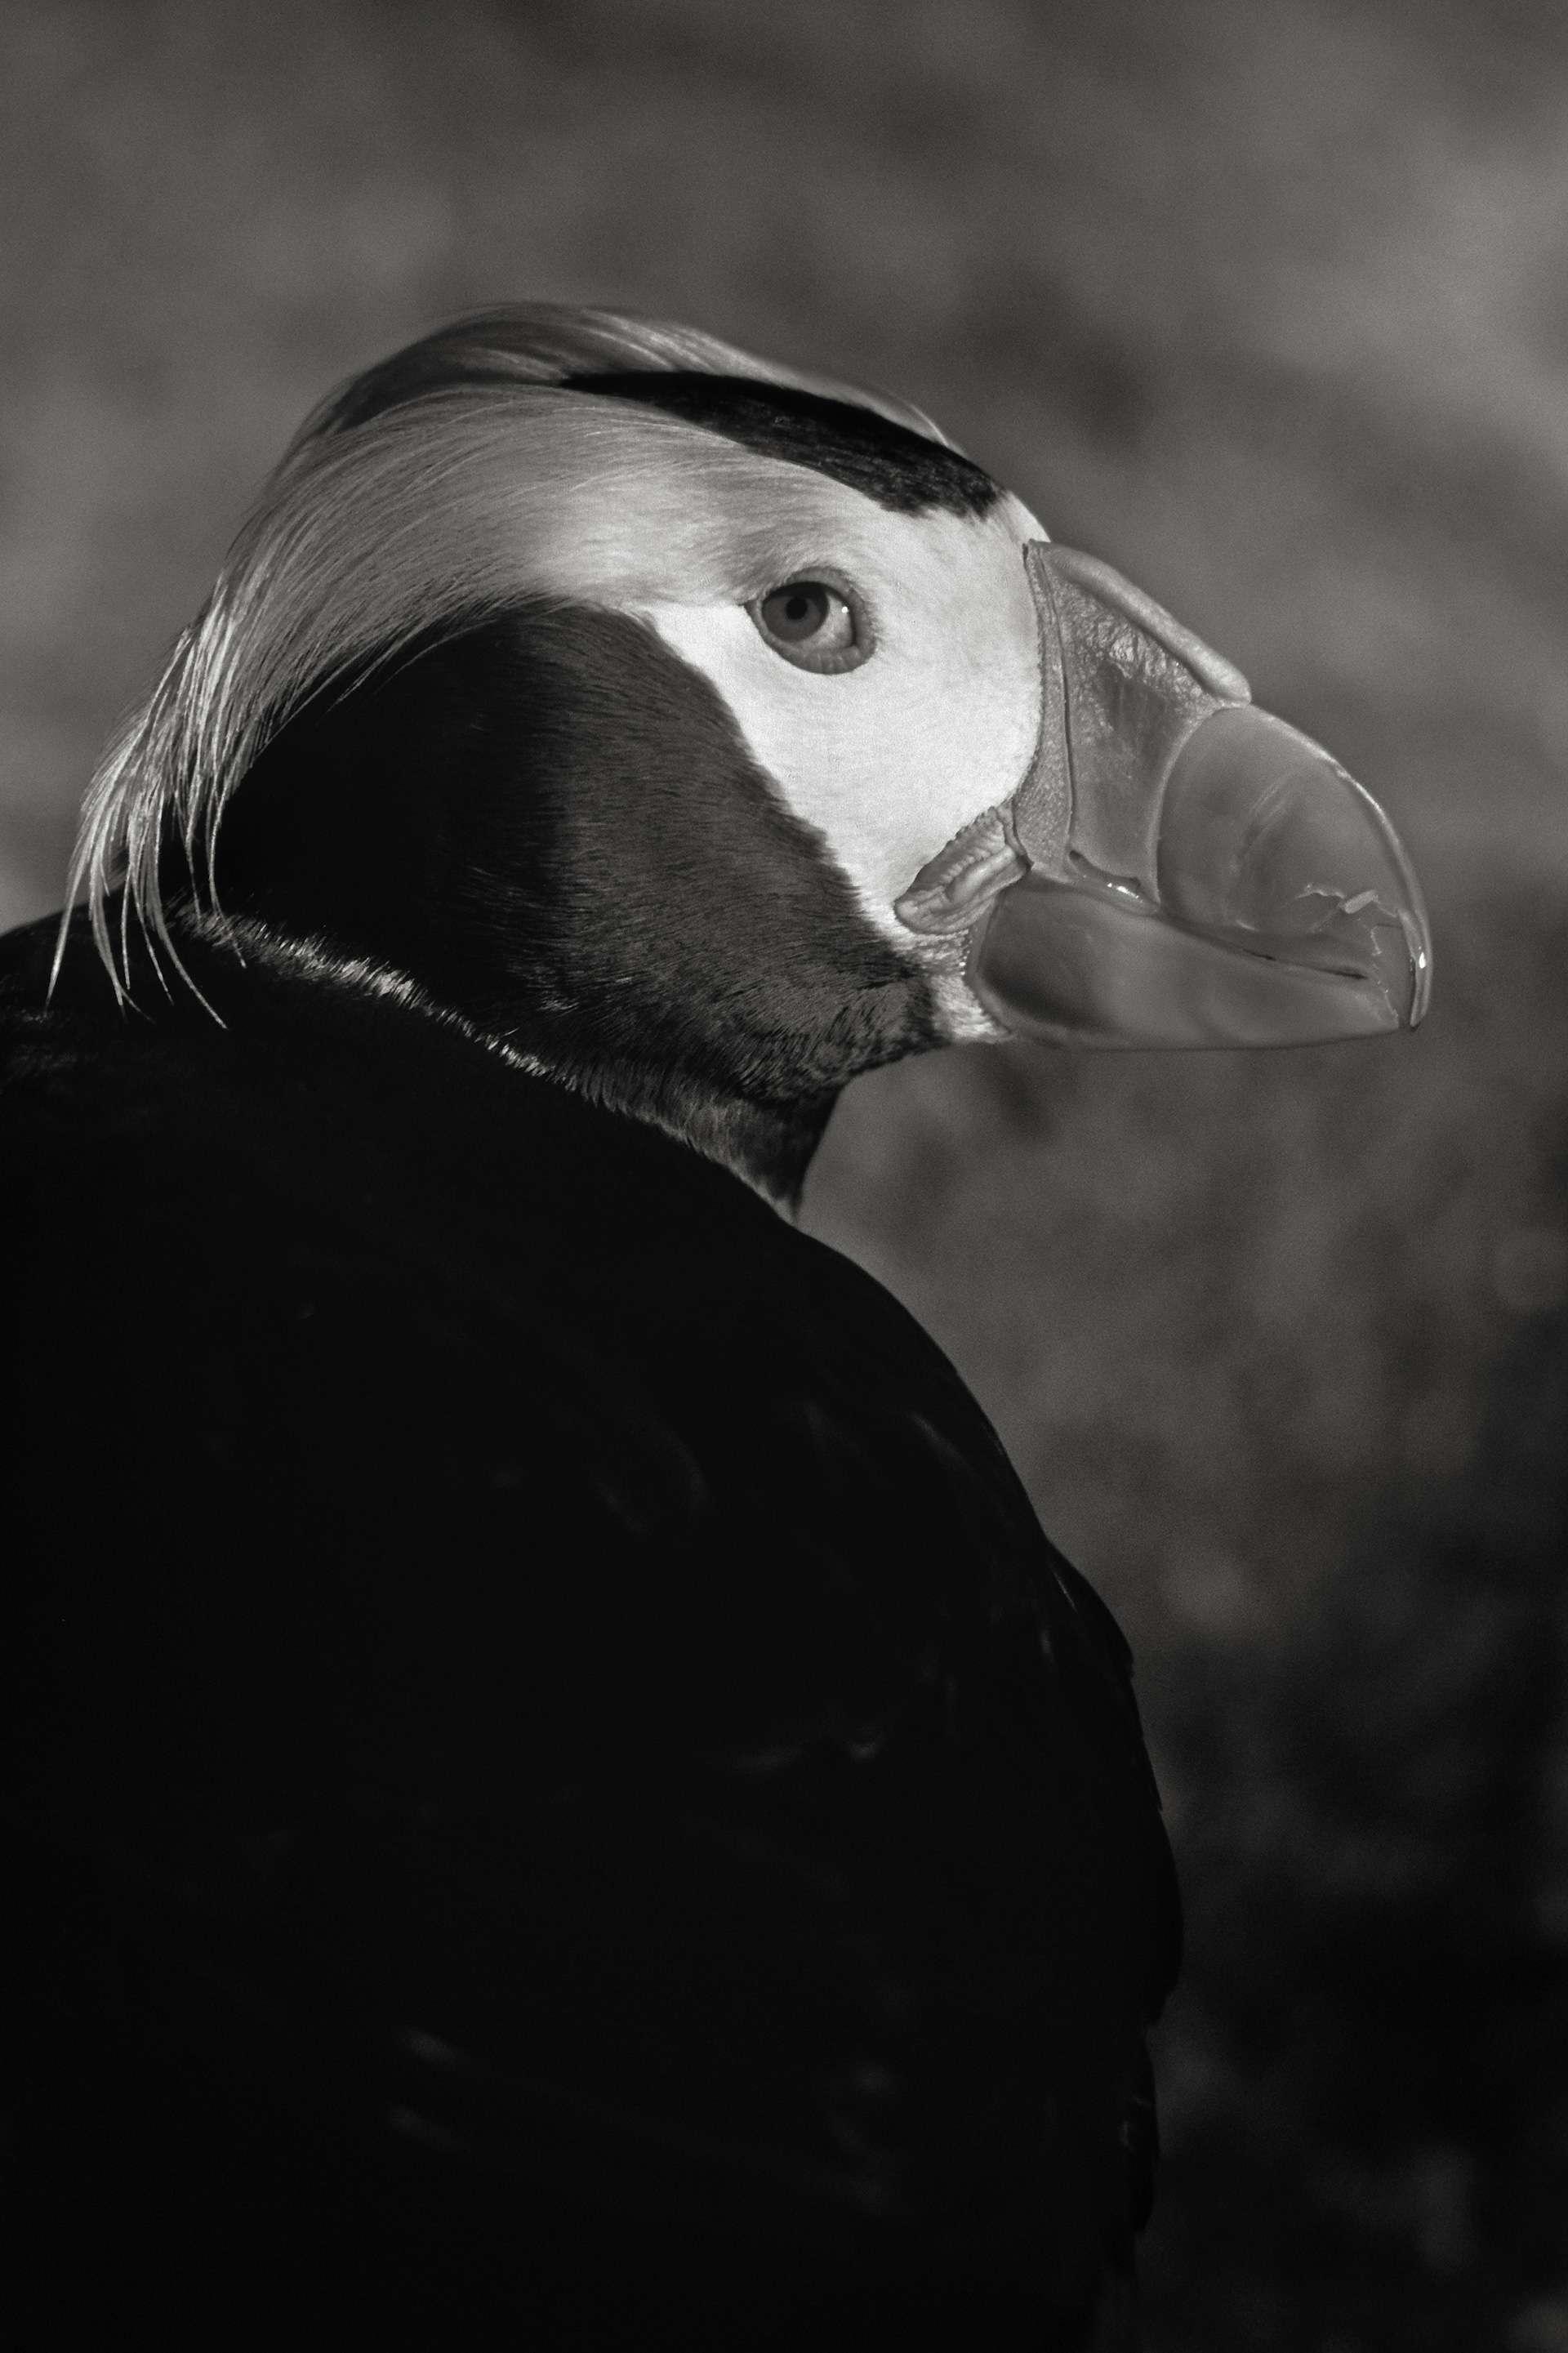 Photographie de Gilles Martin : macareux huppé d'Alaska, Struggle for life